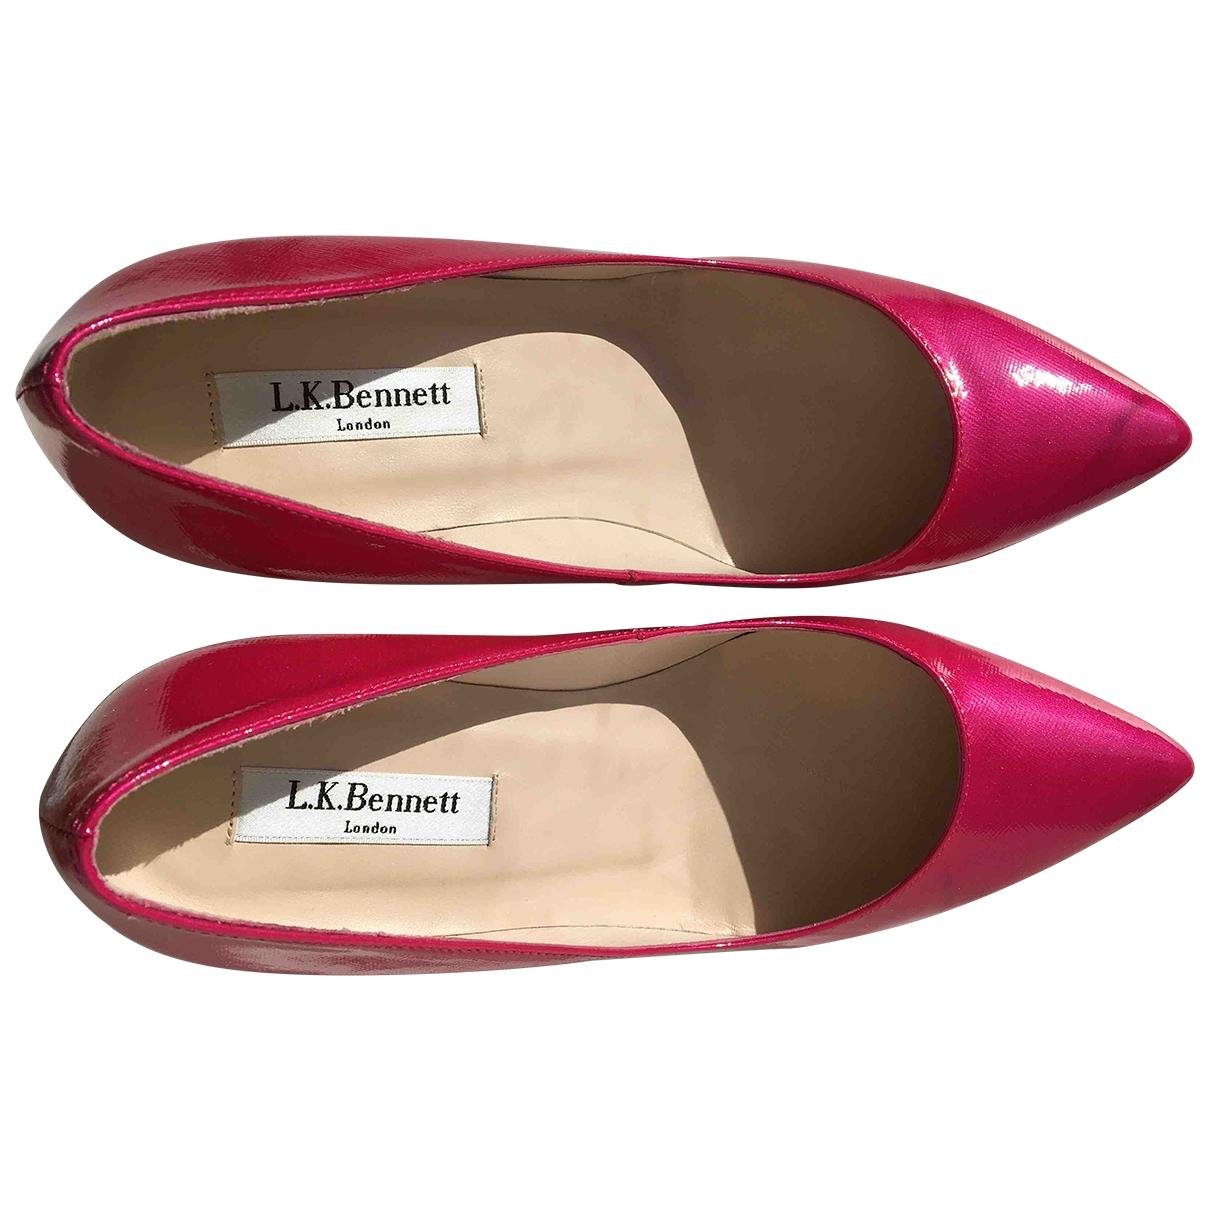 Lk Bennett - Escarpins   pour femme en cuir verni - rose